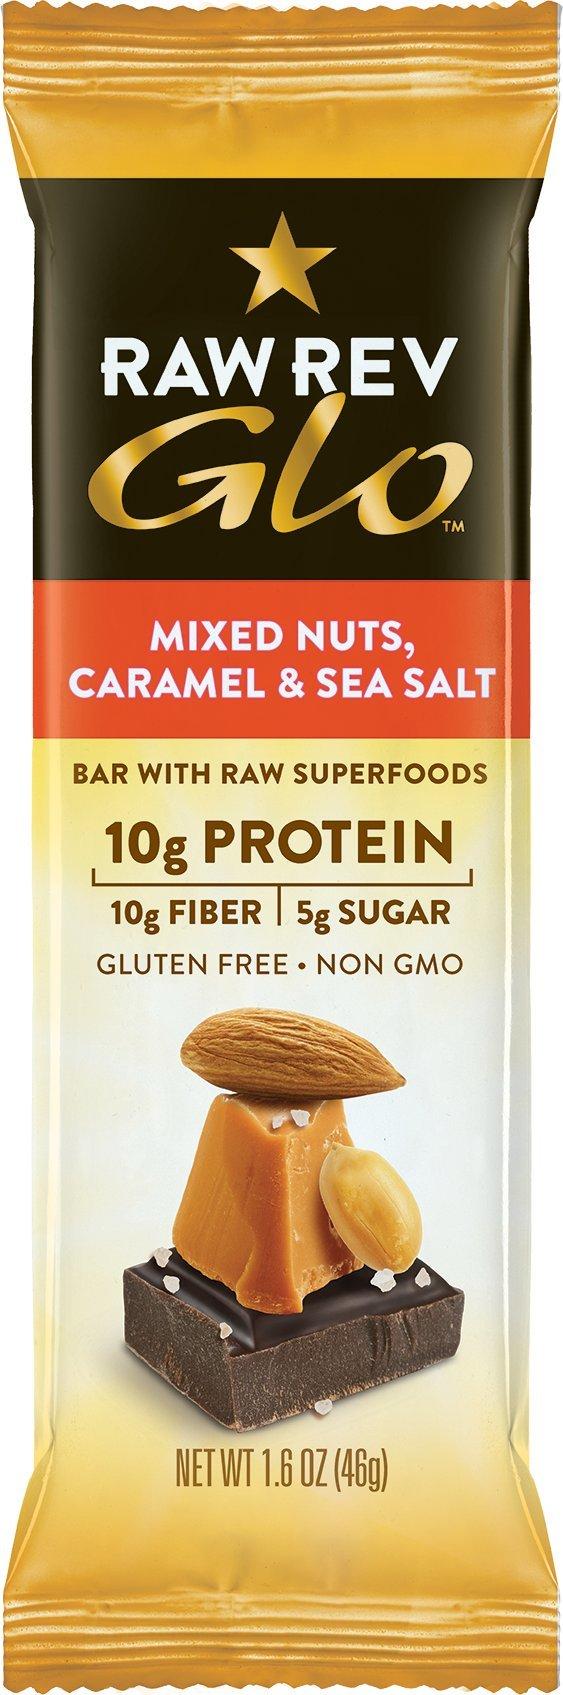 Raw Rev Glo Vegan, Gluten-Free Protein Bars - Mixed Nuts Caramel & Sea Salt 1.6 ounce (Pack of 24)